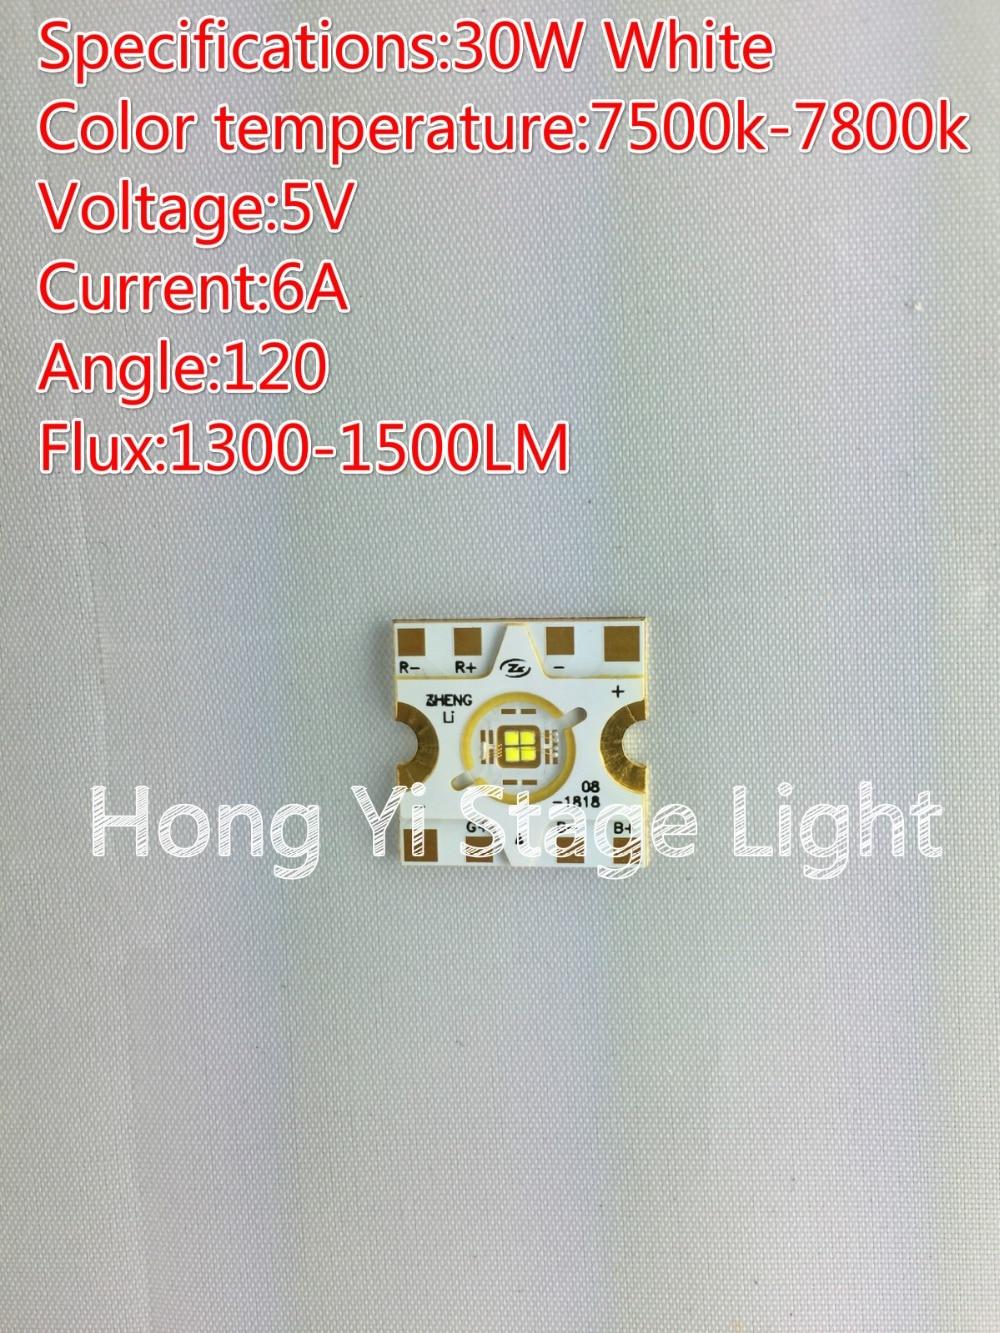 best top dlp light brands and get free shipping - hc2469k6